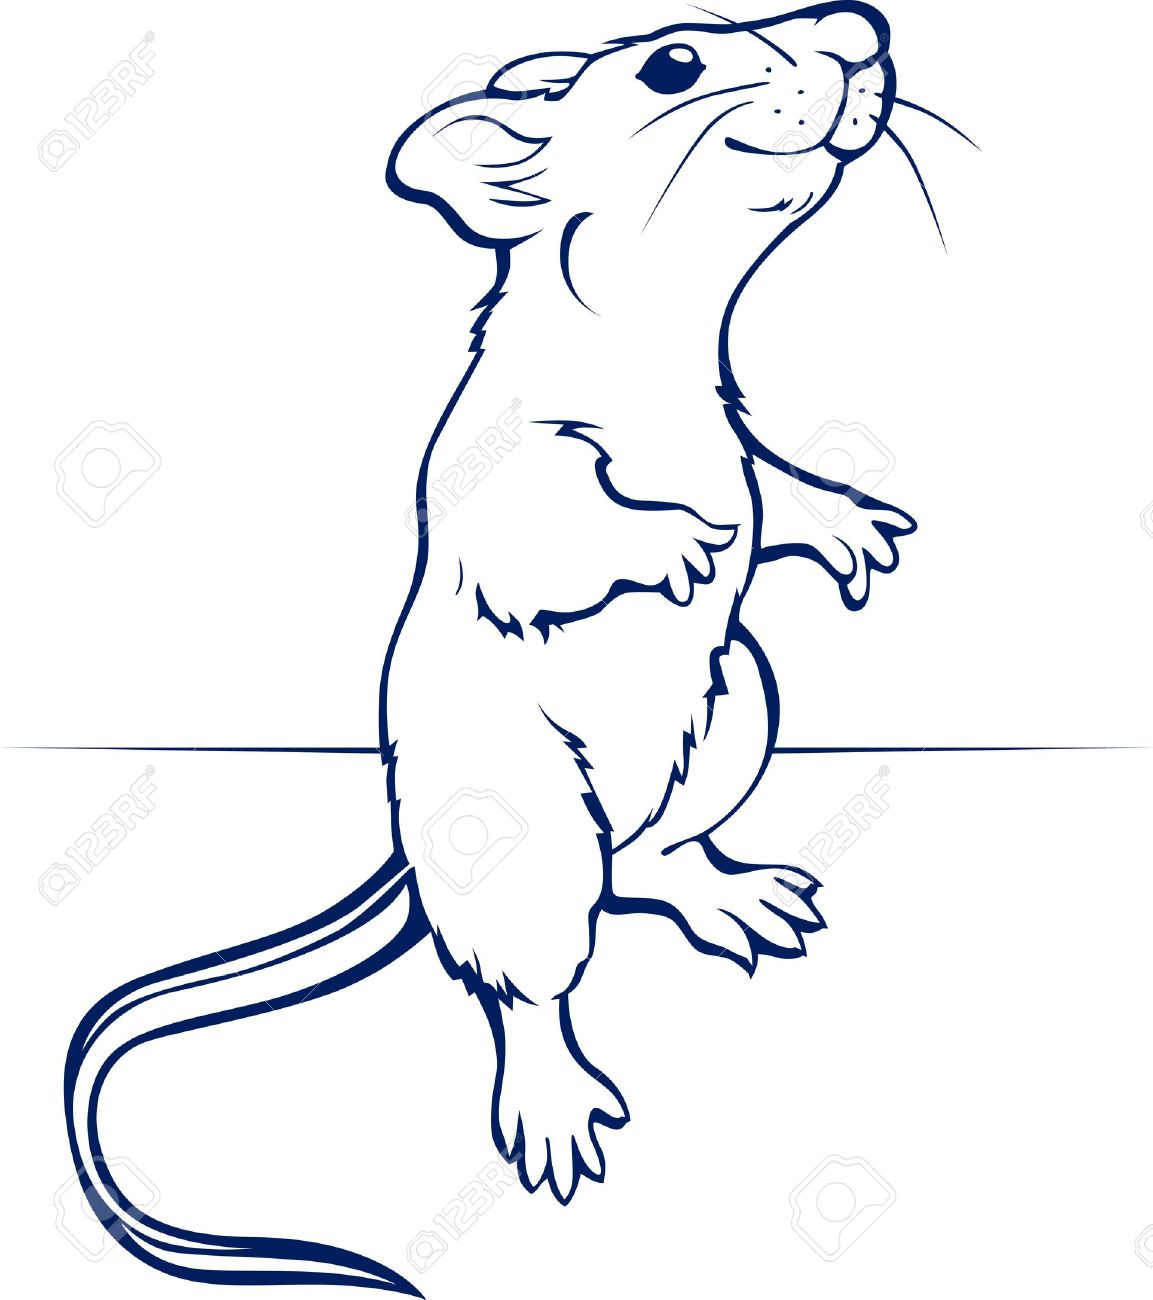 cartoon rat or mouse - 9554781